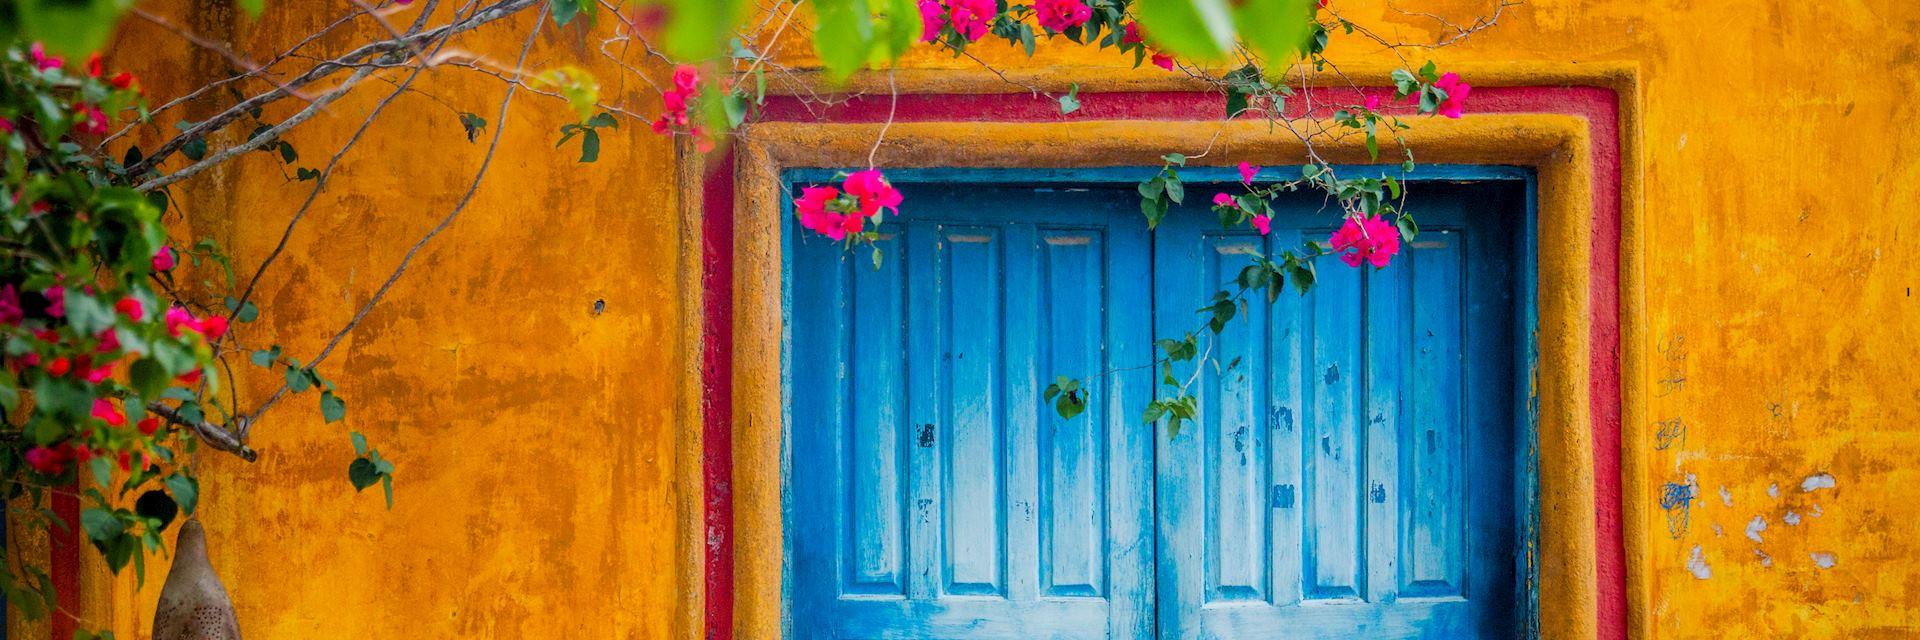 Doorway in Trancoso